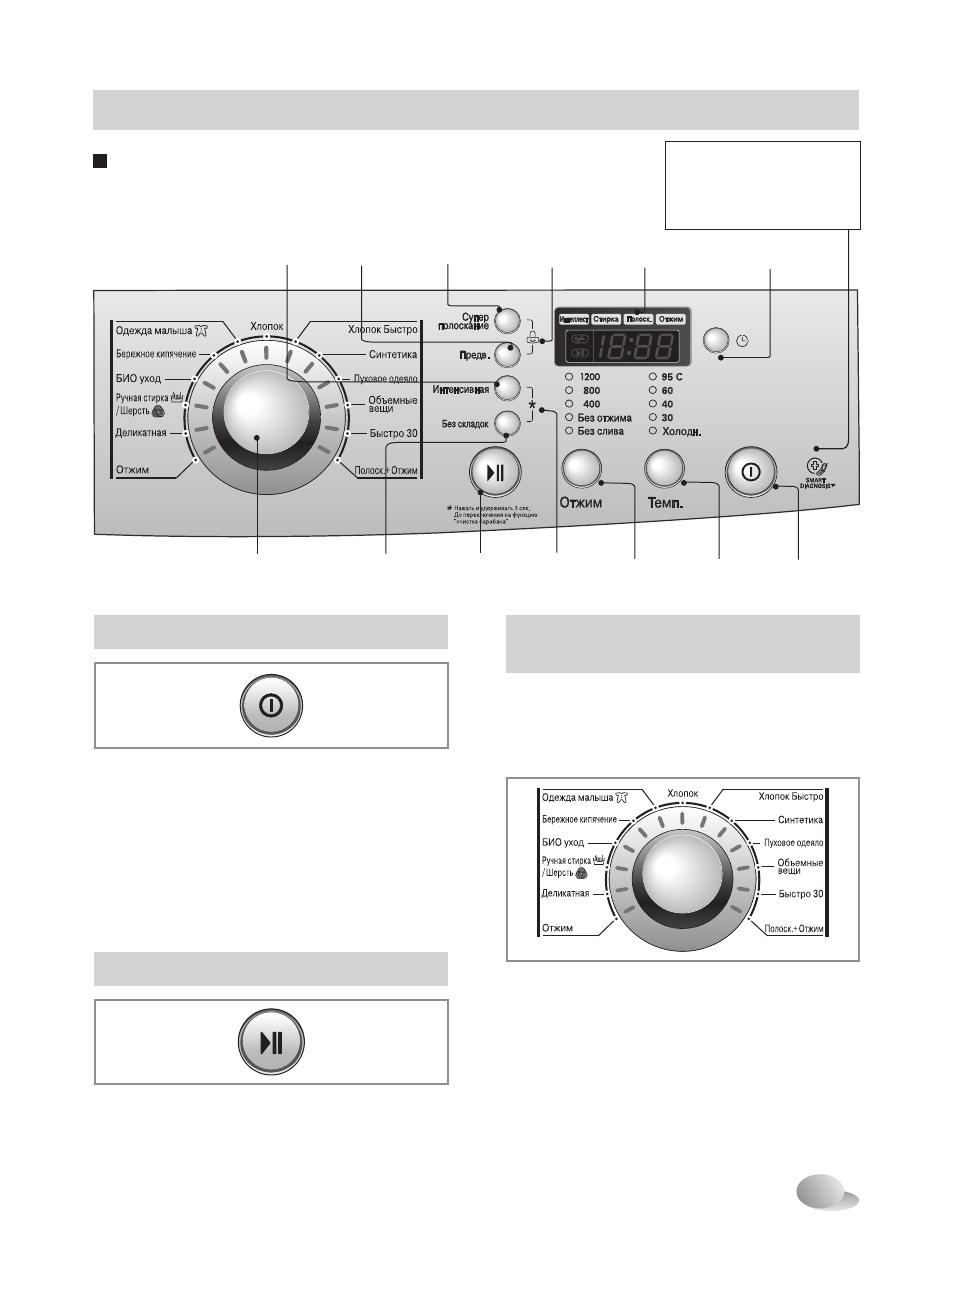 Стиральная Машина LG E1289nd5 инструкция